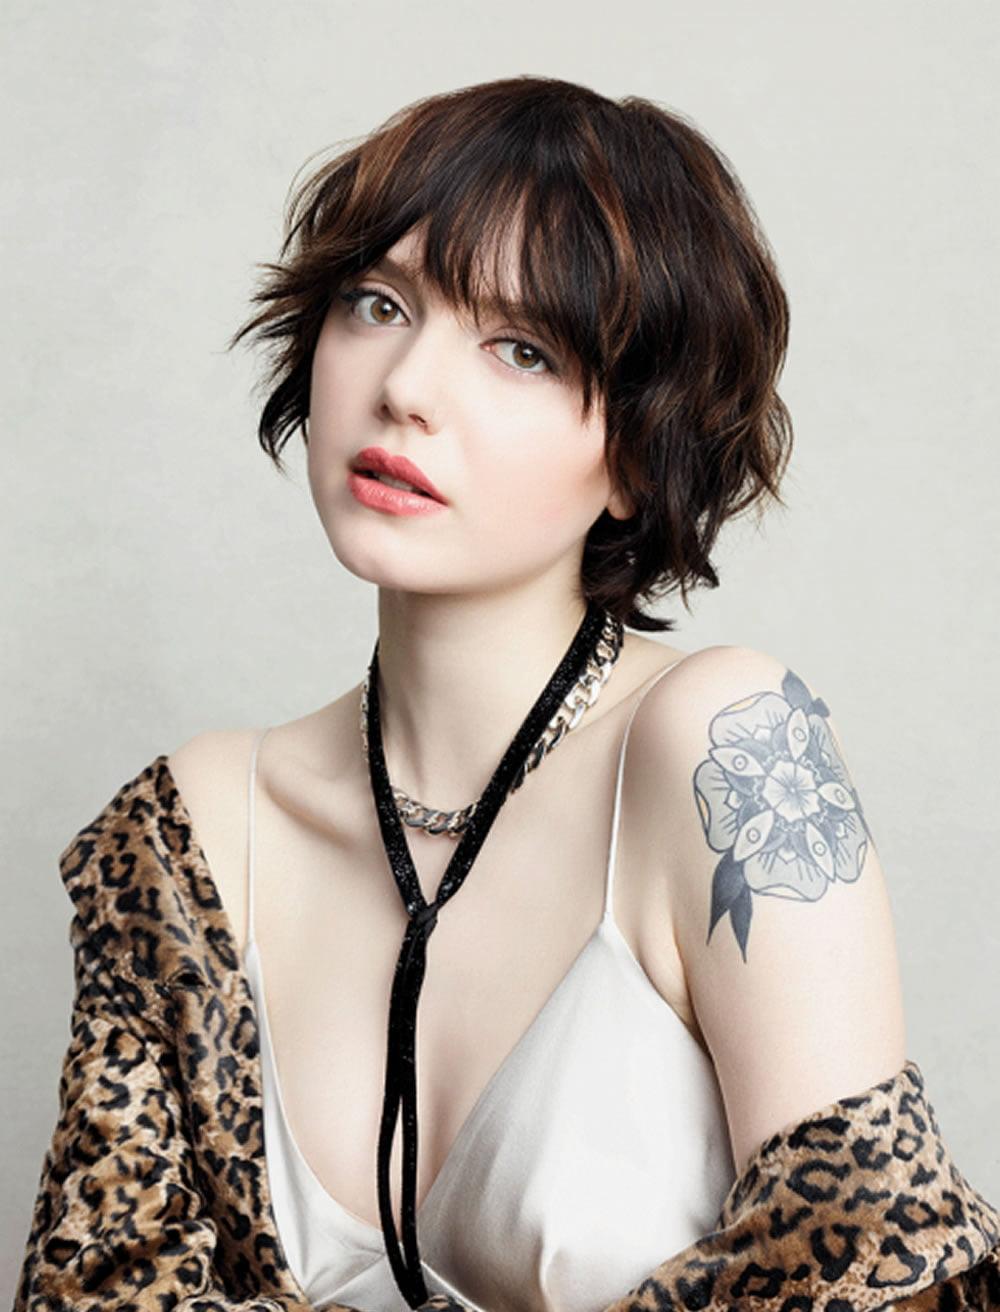 Easy Hairstyles For Short Hair 2018-2019 & Pixie Hair Cuts